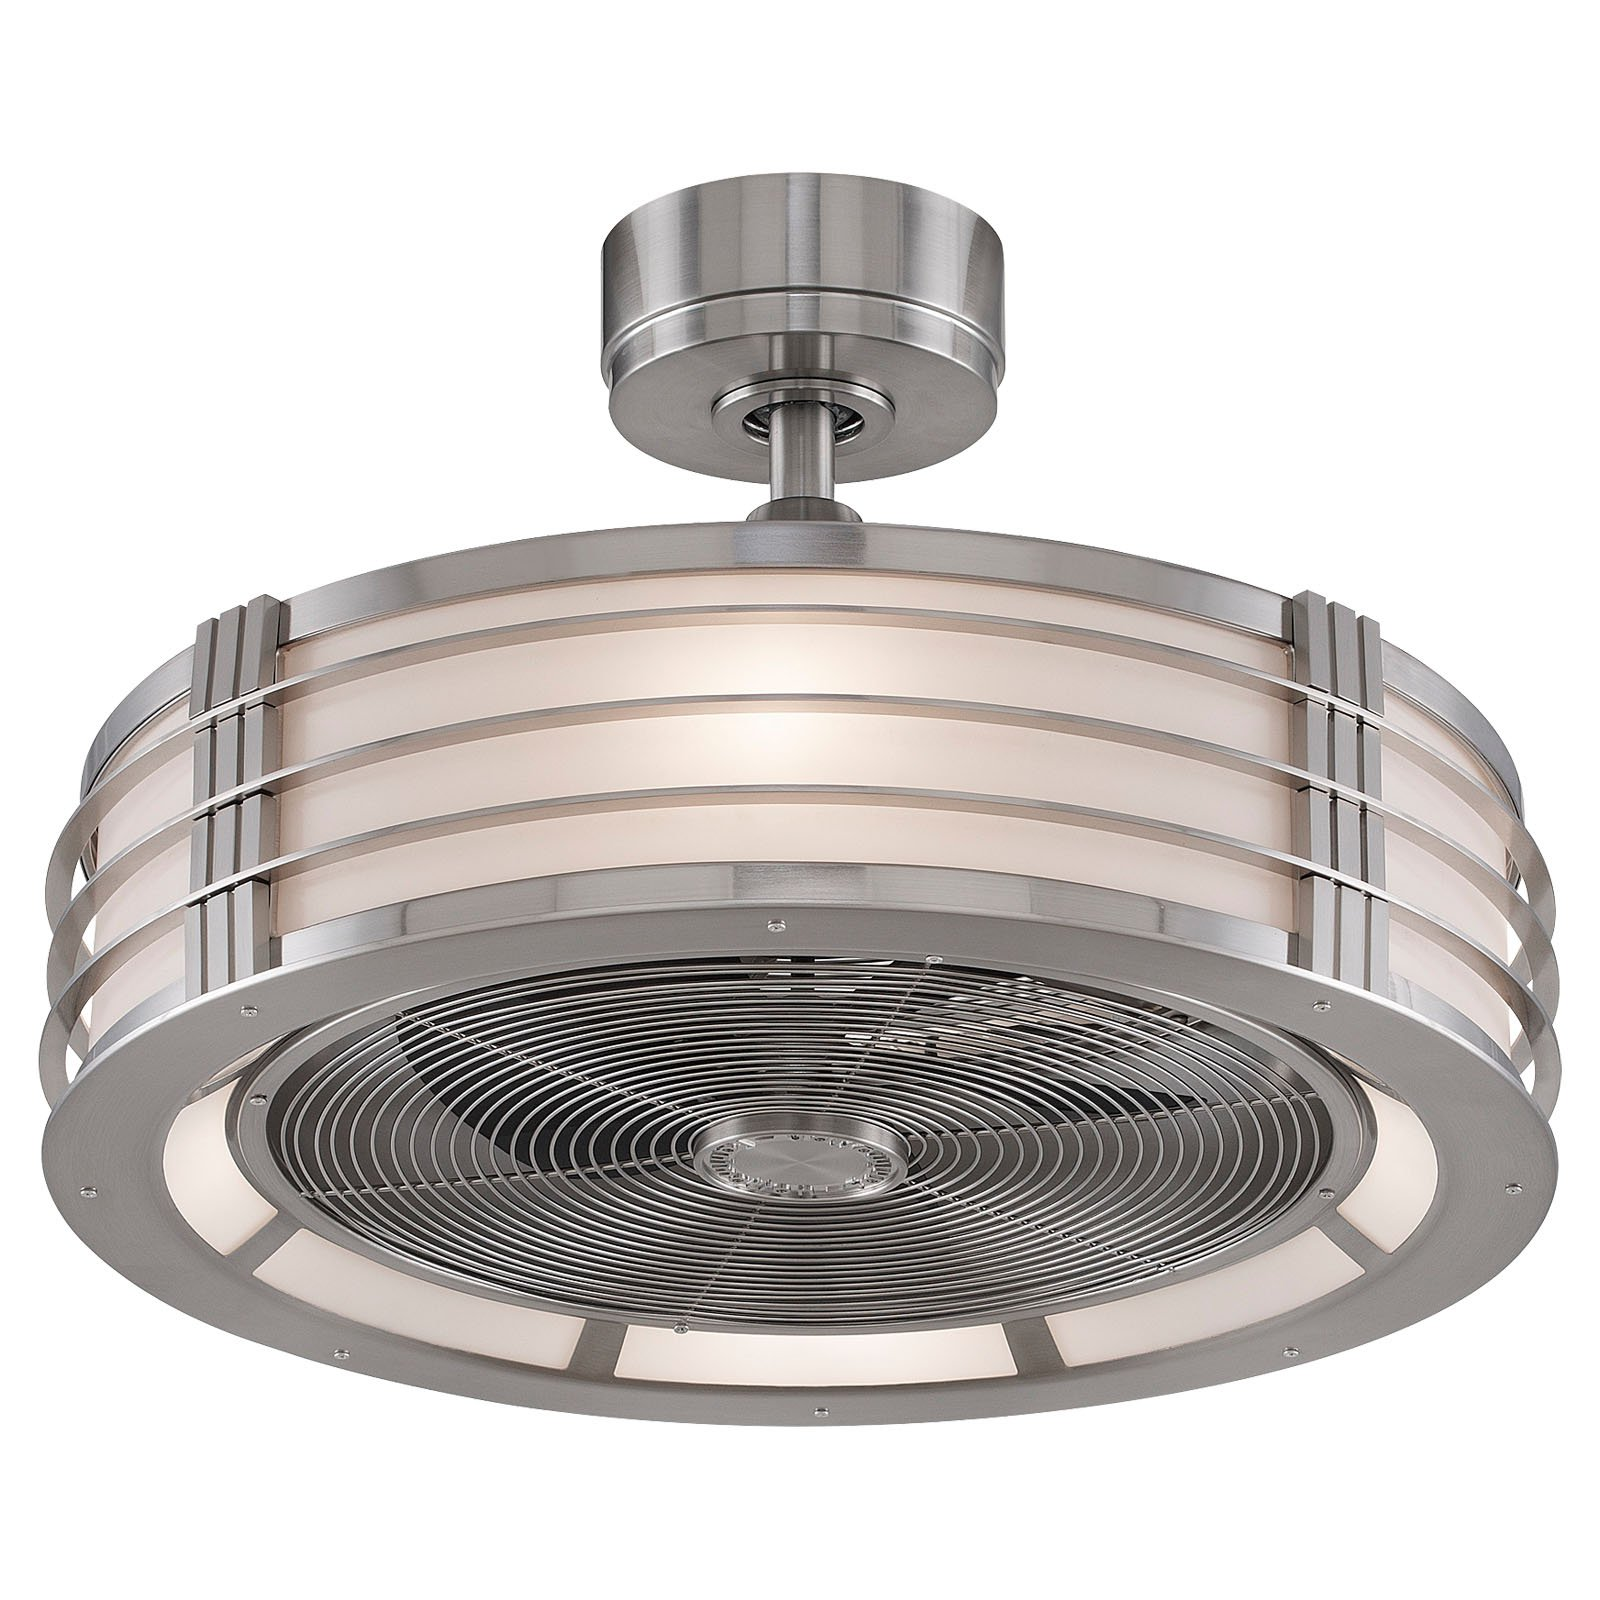 enclosed ceiling fan photo - 6